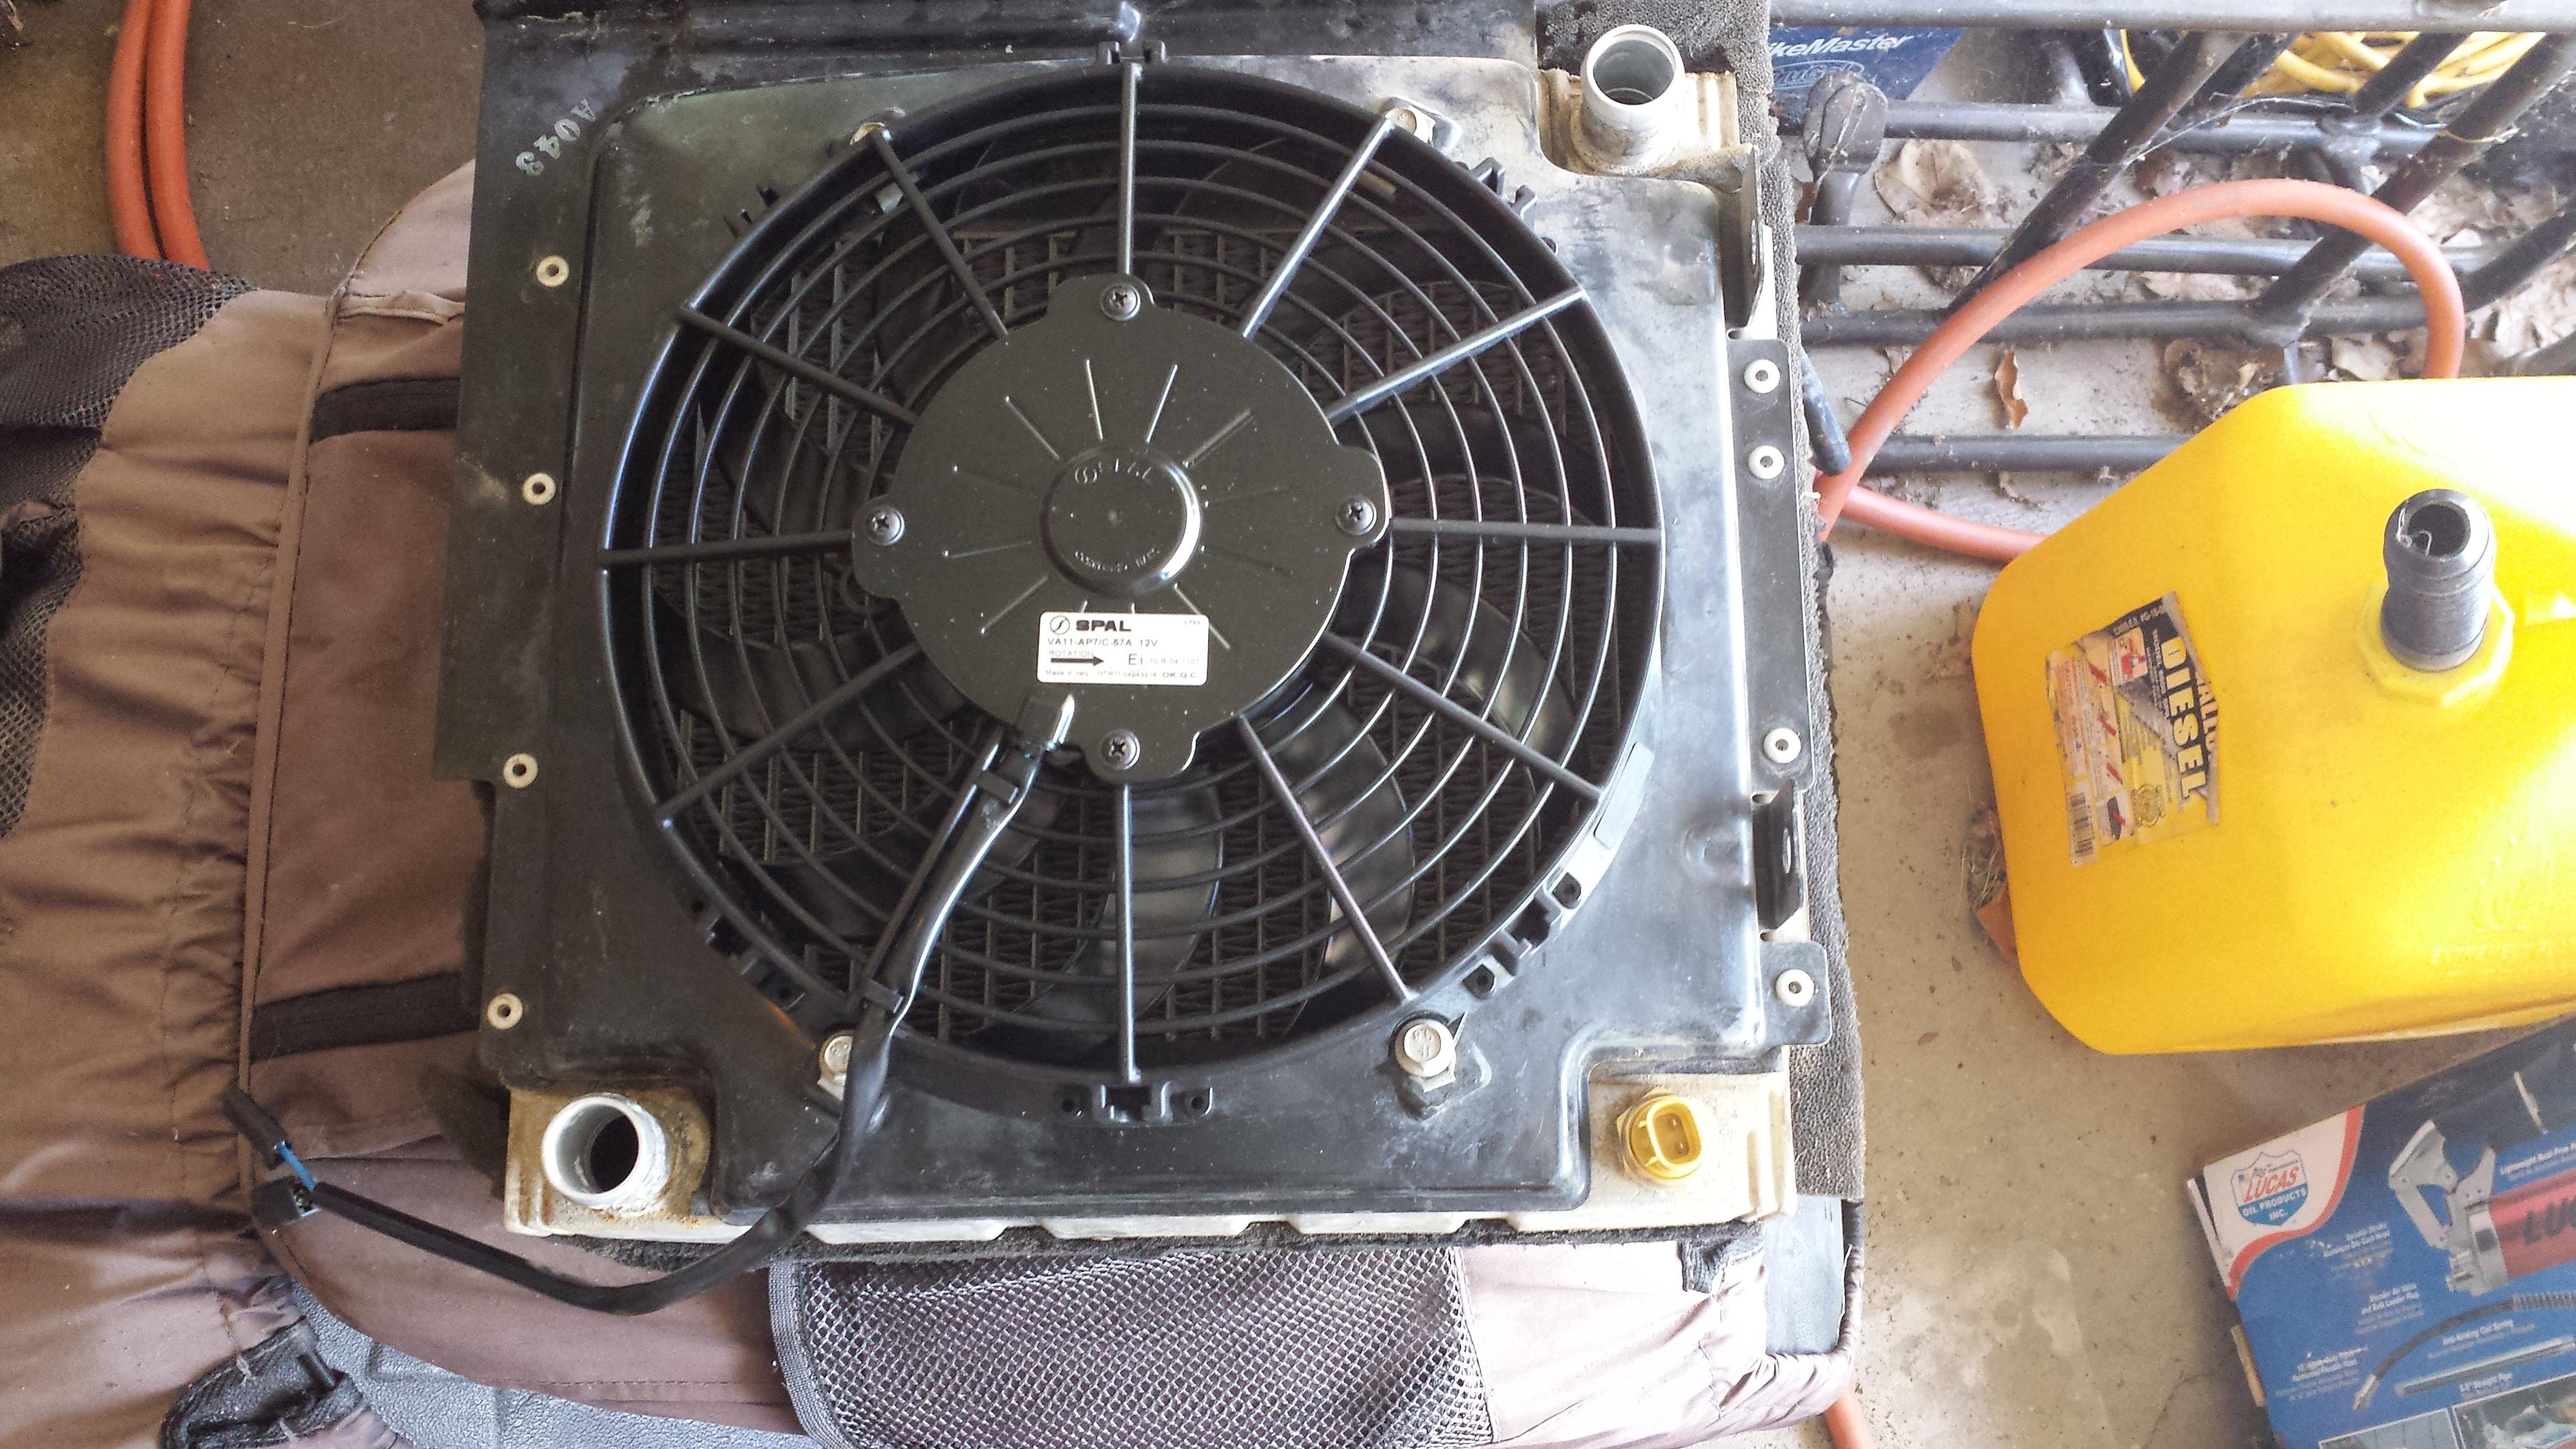 John Deere Gator 825i Wiring Diagram And Schematics Cx Gas Fog Light Relay